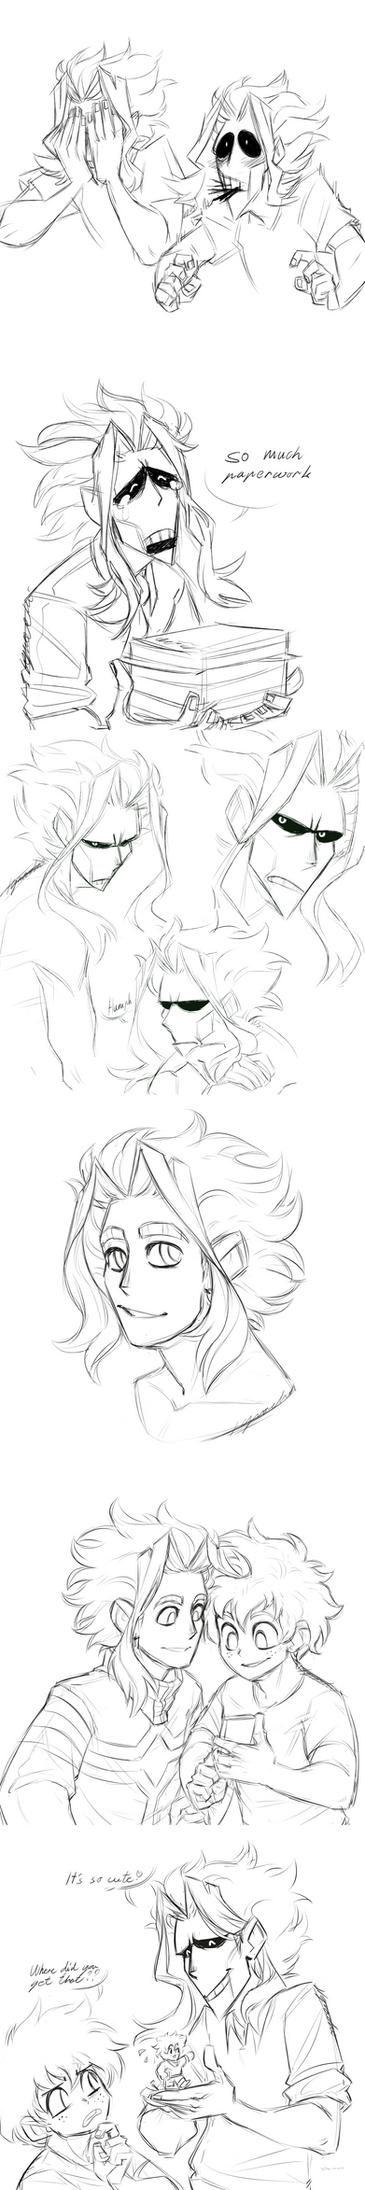 Toshinori Skethces Dump by Nara-chann